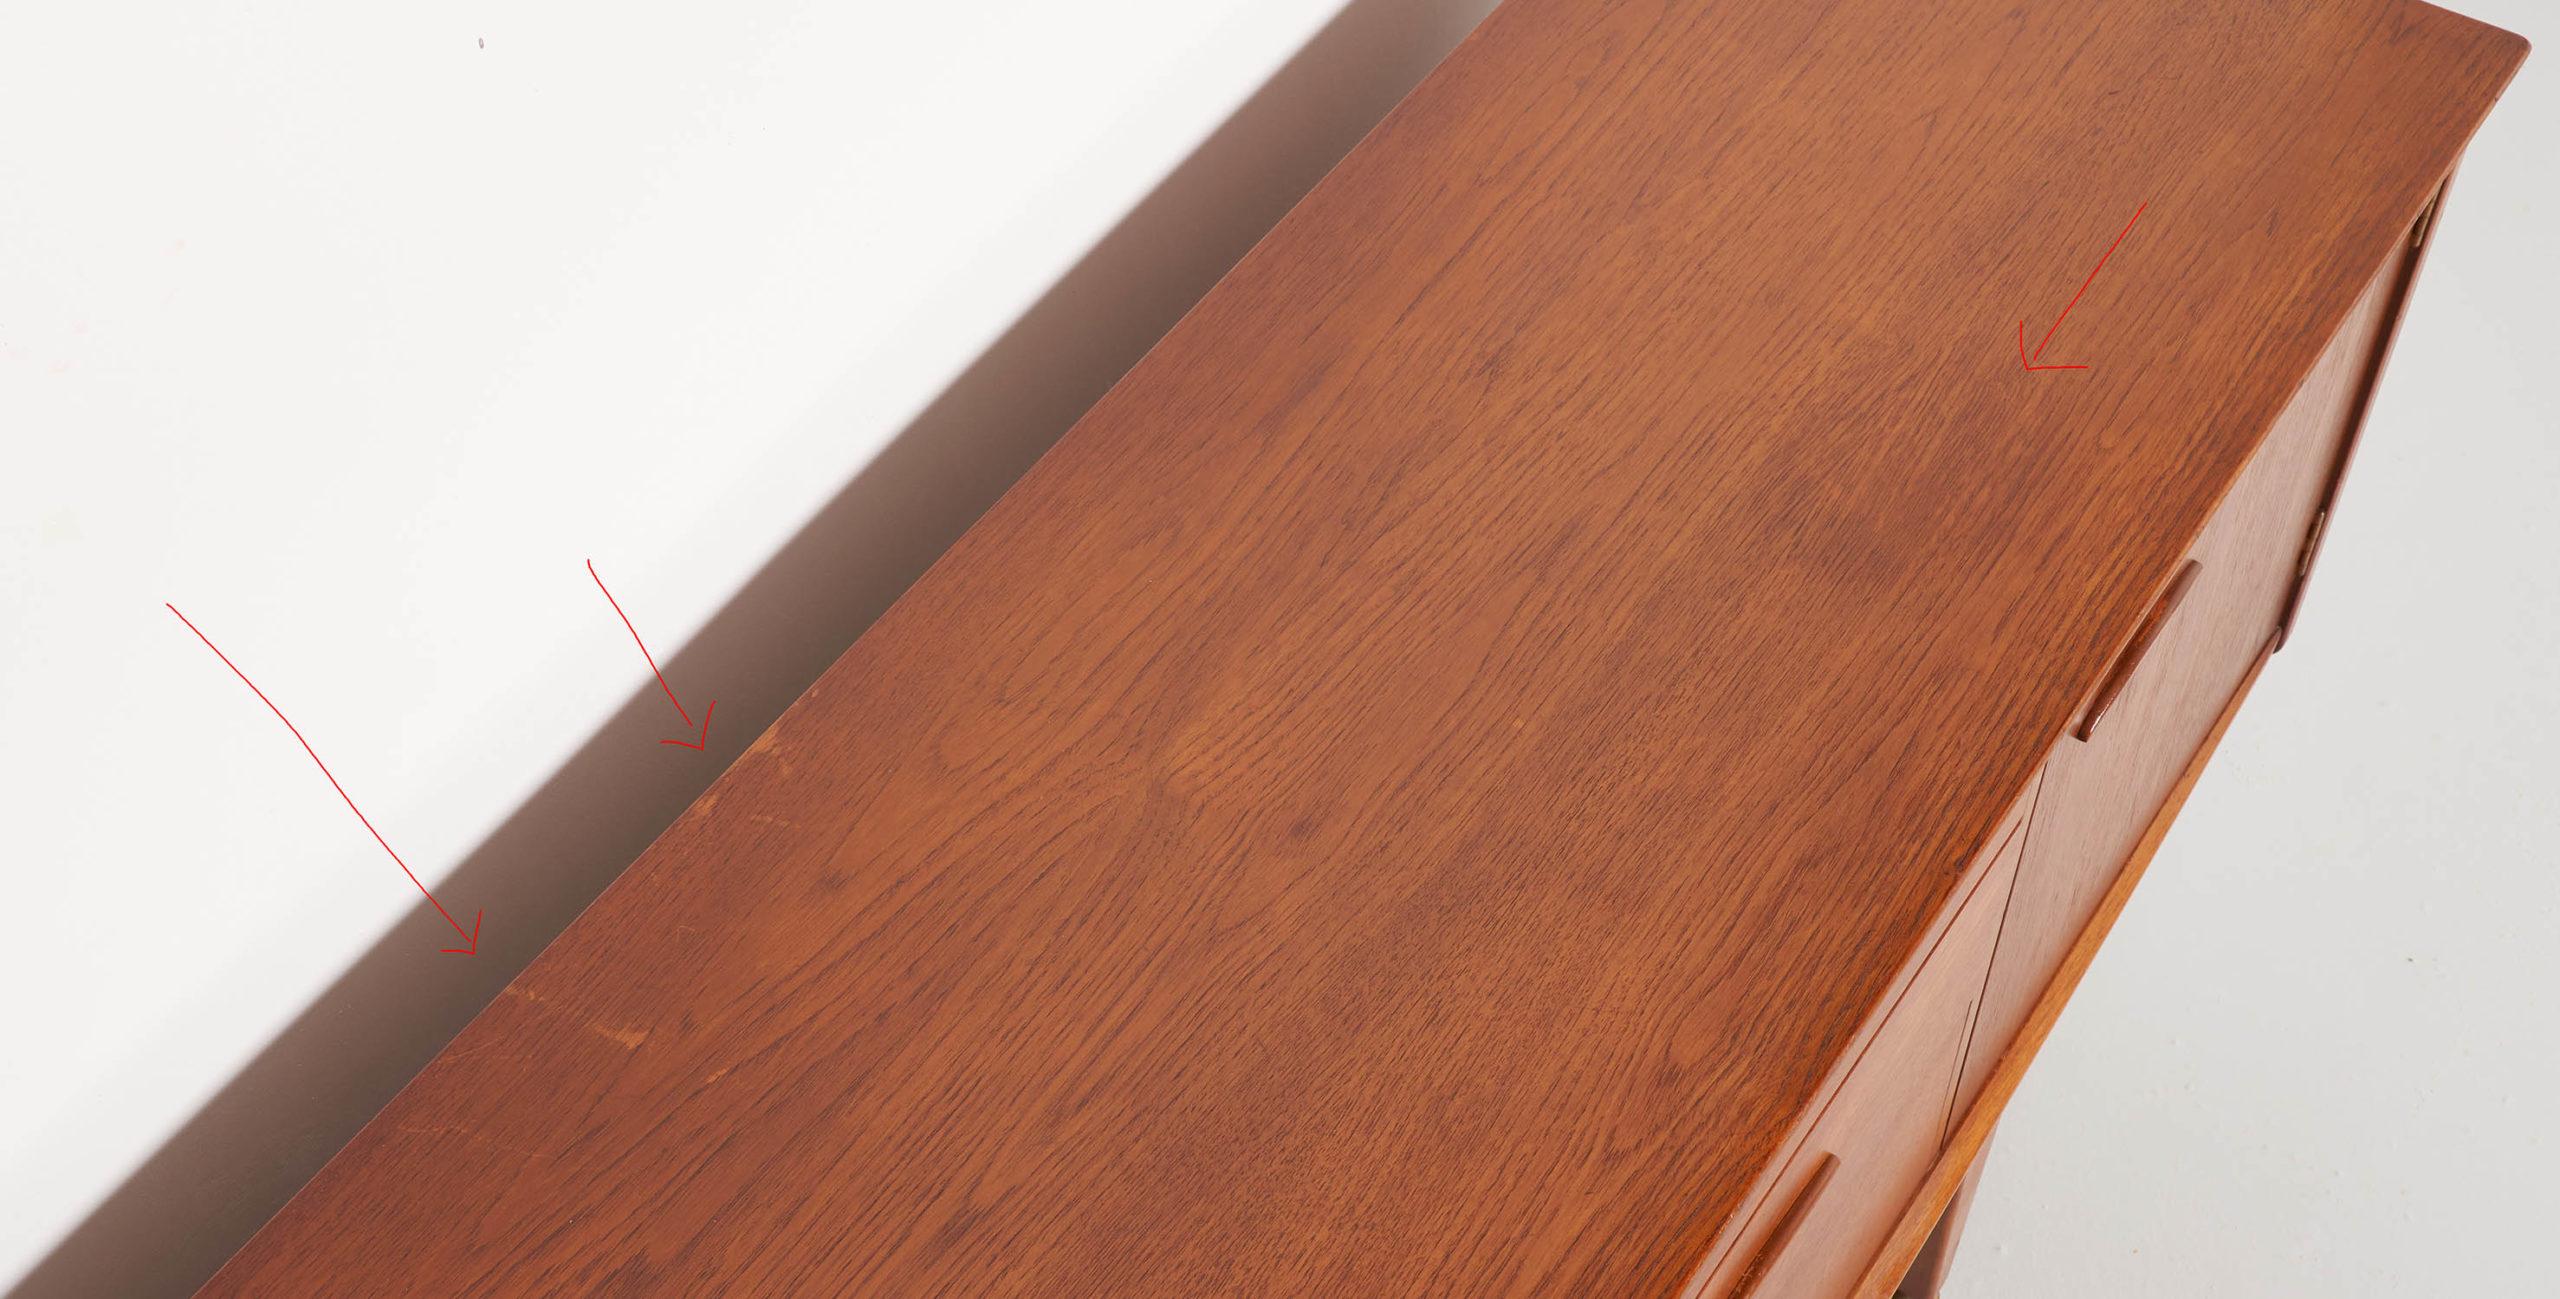 enfilade jentique, jentique, enfilade 150cm, enfilade anglaise vintage, enfilade en teck vintage, enfilade style scandinave, enfilade vintage, enfilade pieds reglables, enfilade